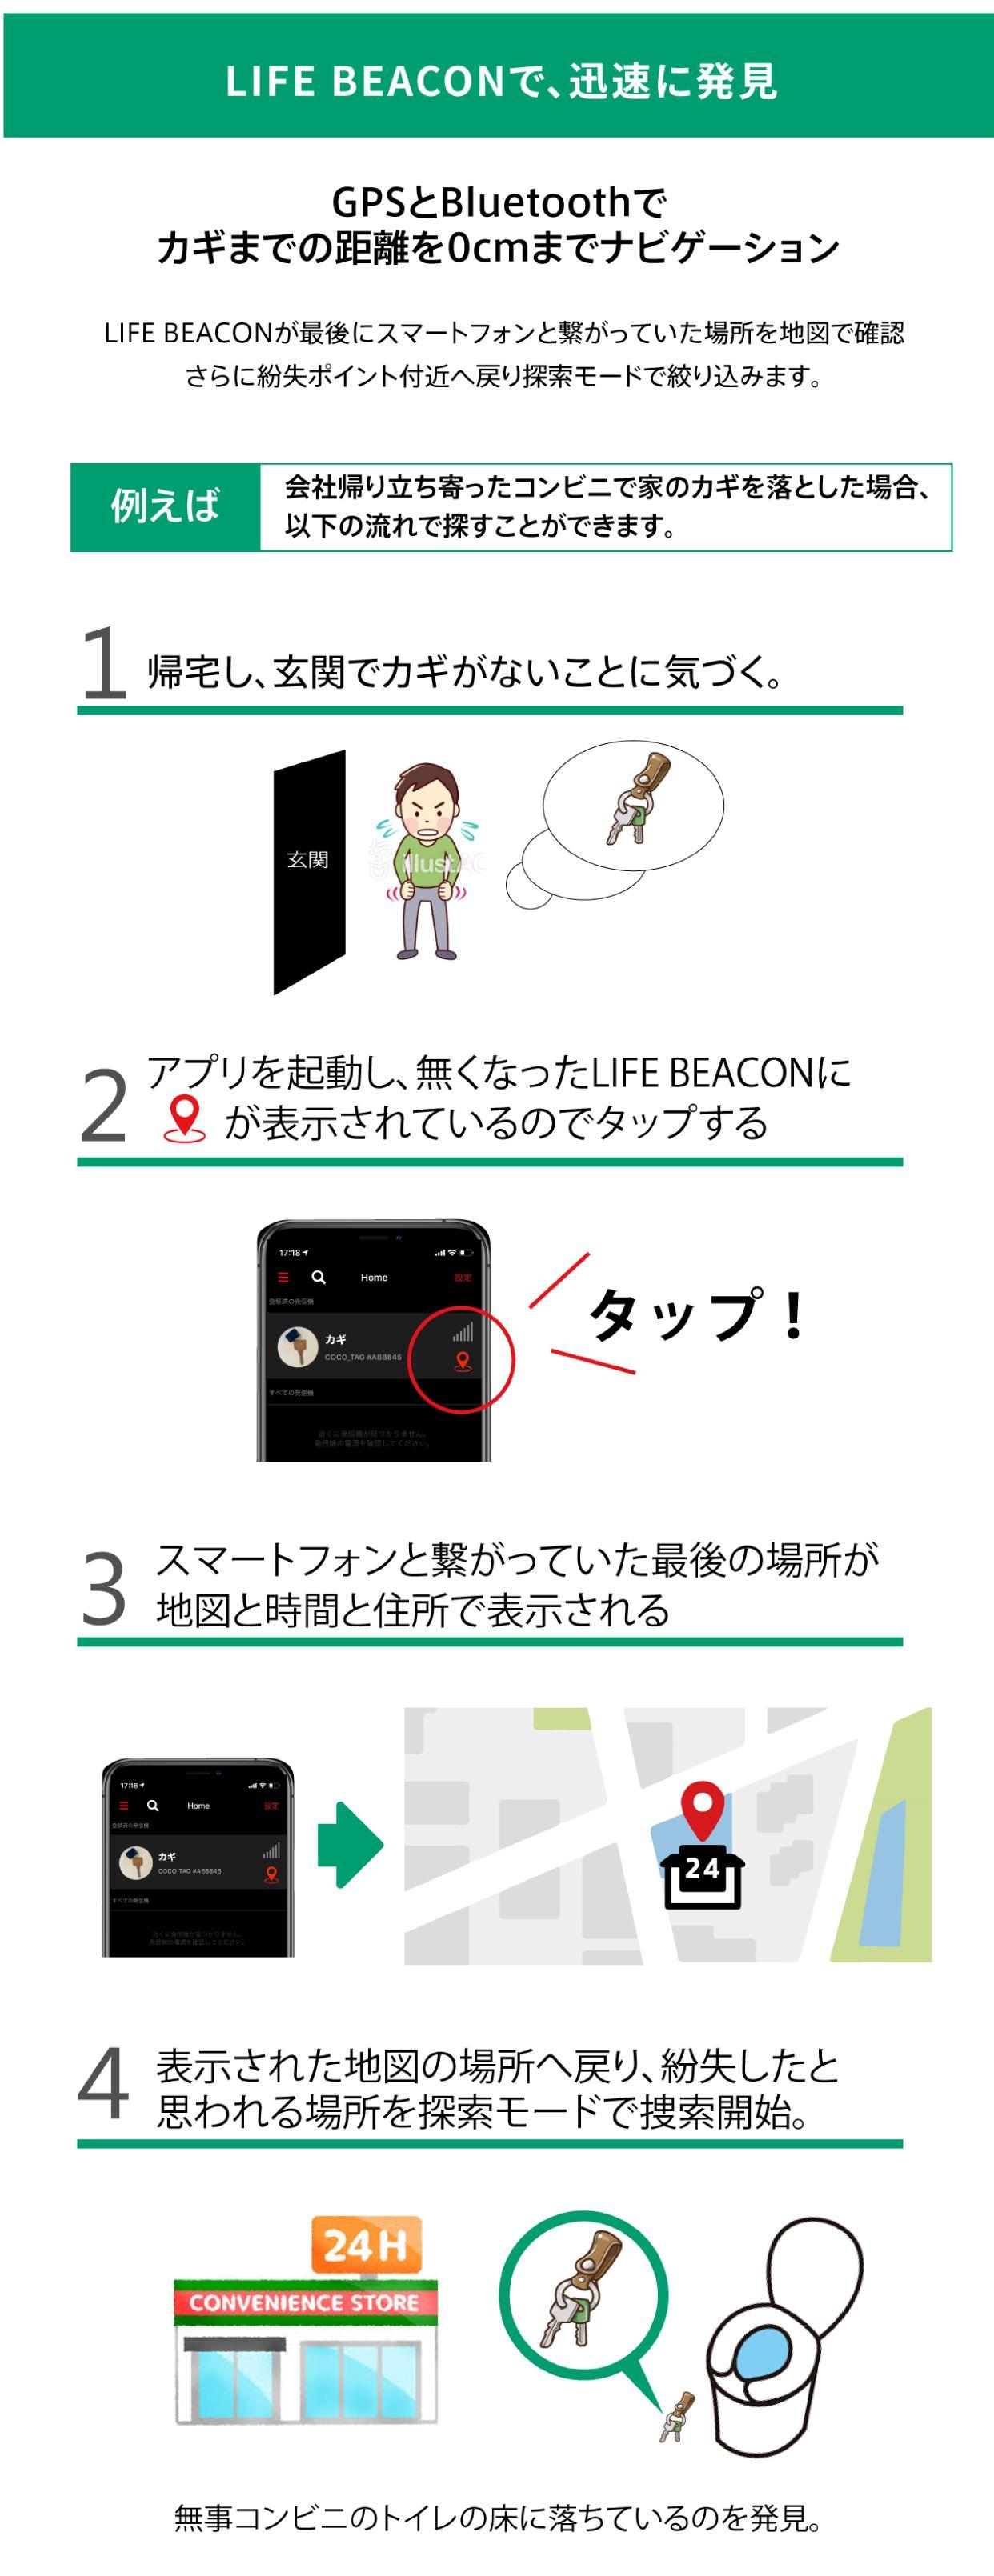 Bluetooth.kinoutuika_Bluetoothtuikakinou.jpg